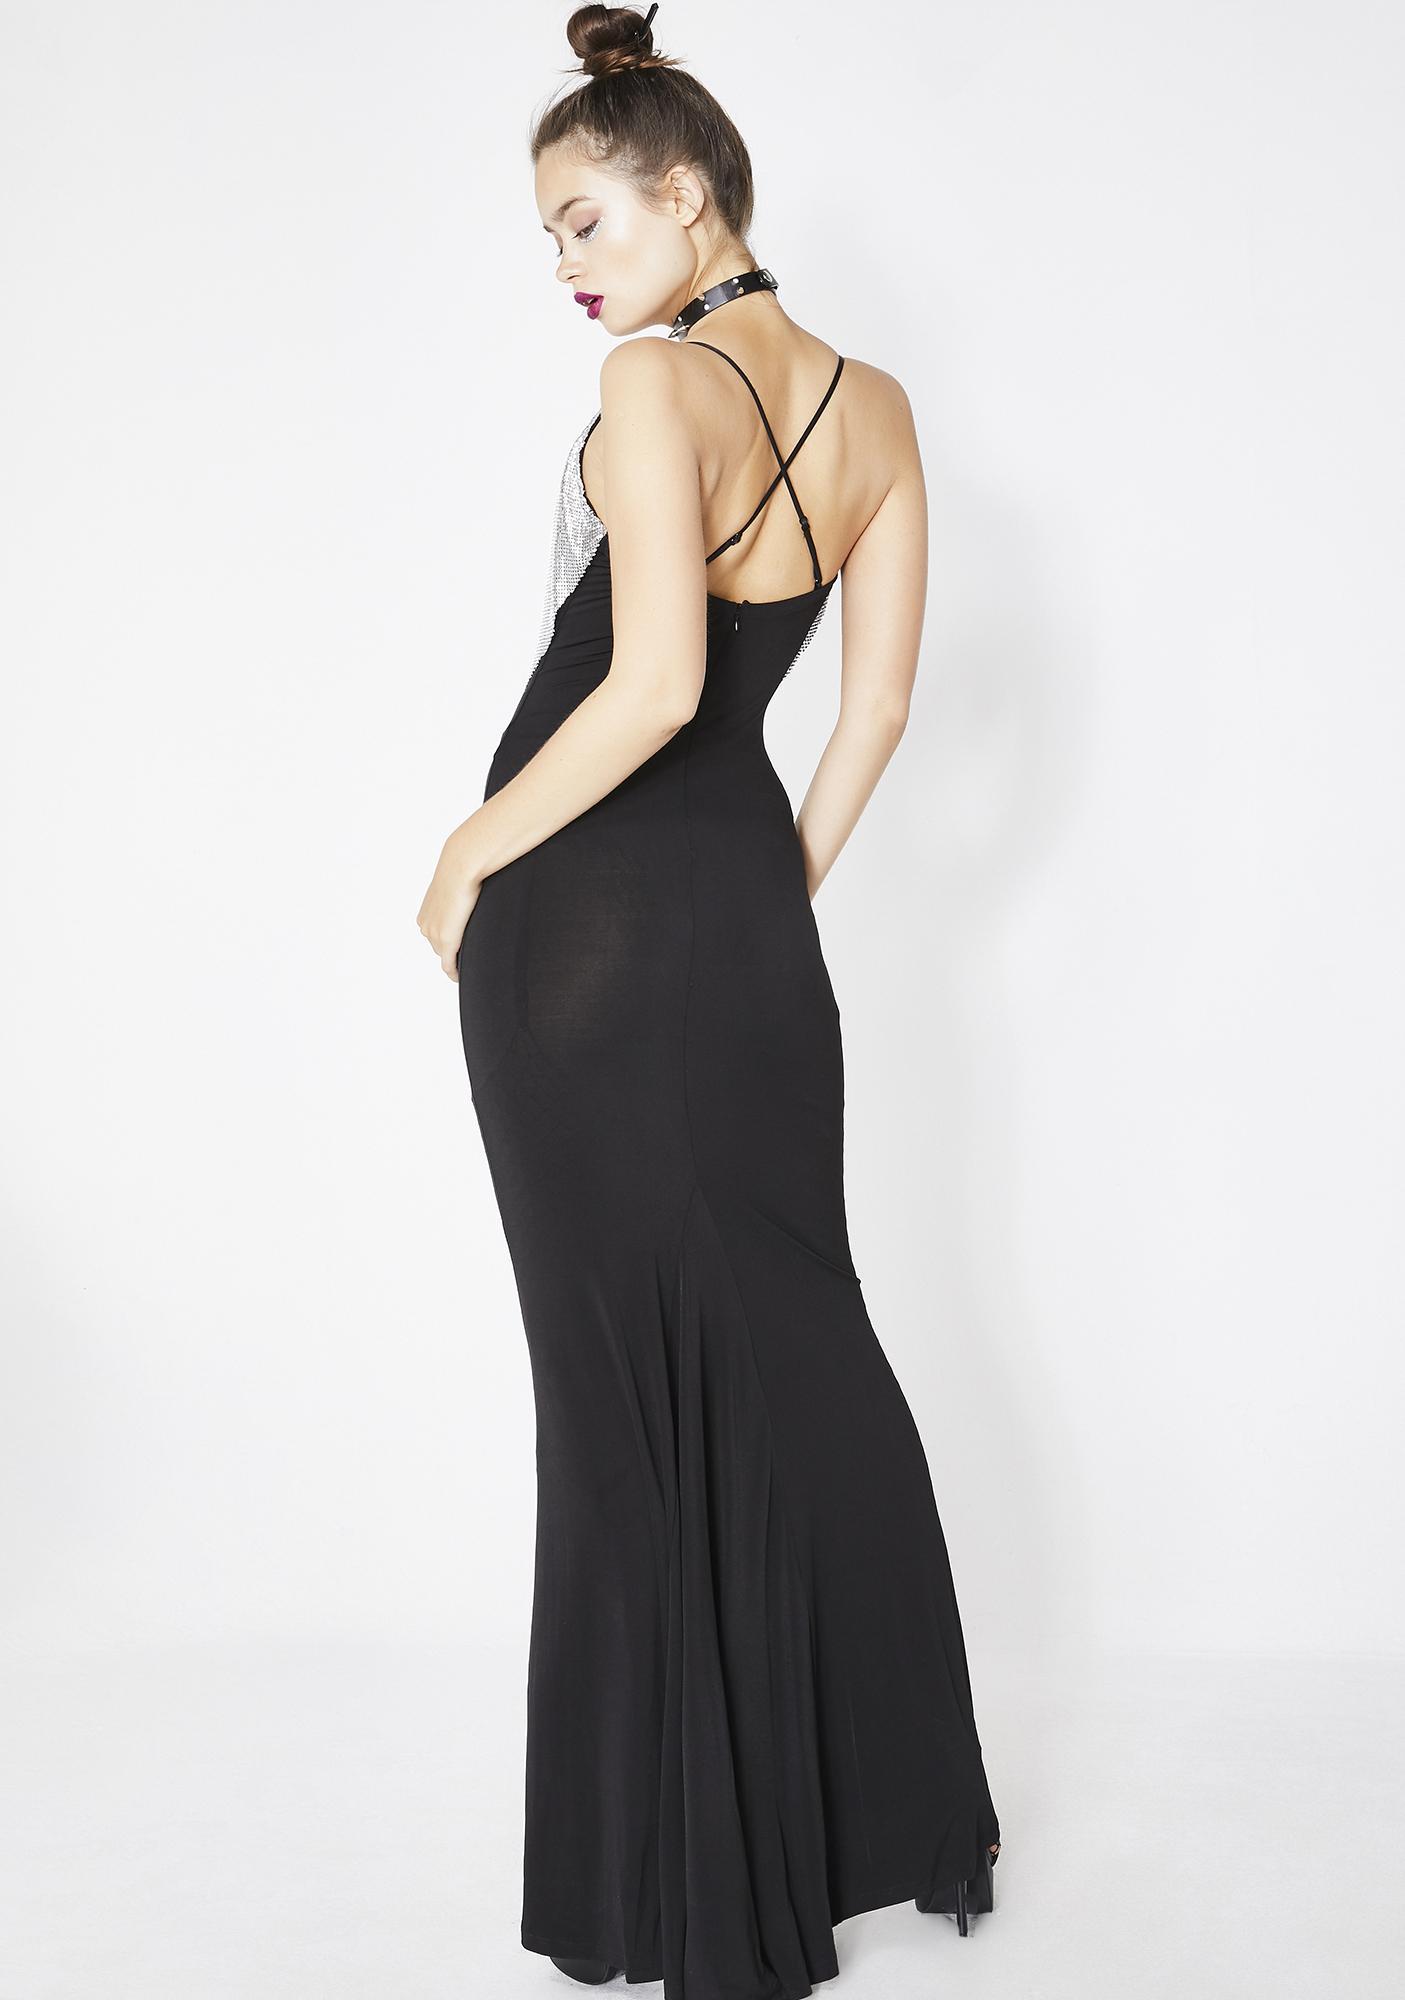 Kiki Riki Dipped In Finesse Chainmail Dress